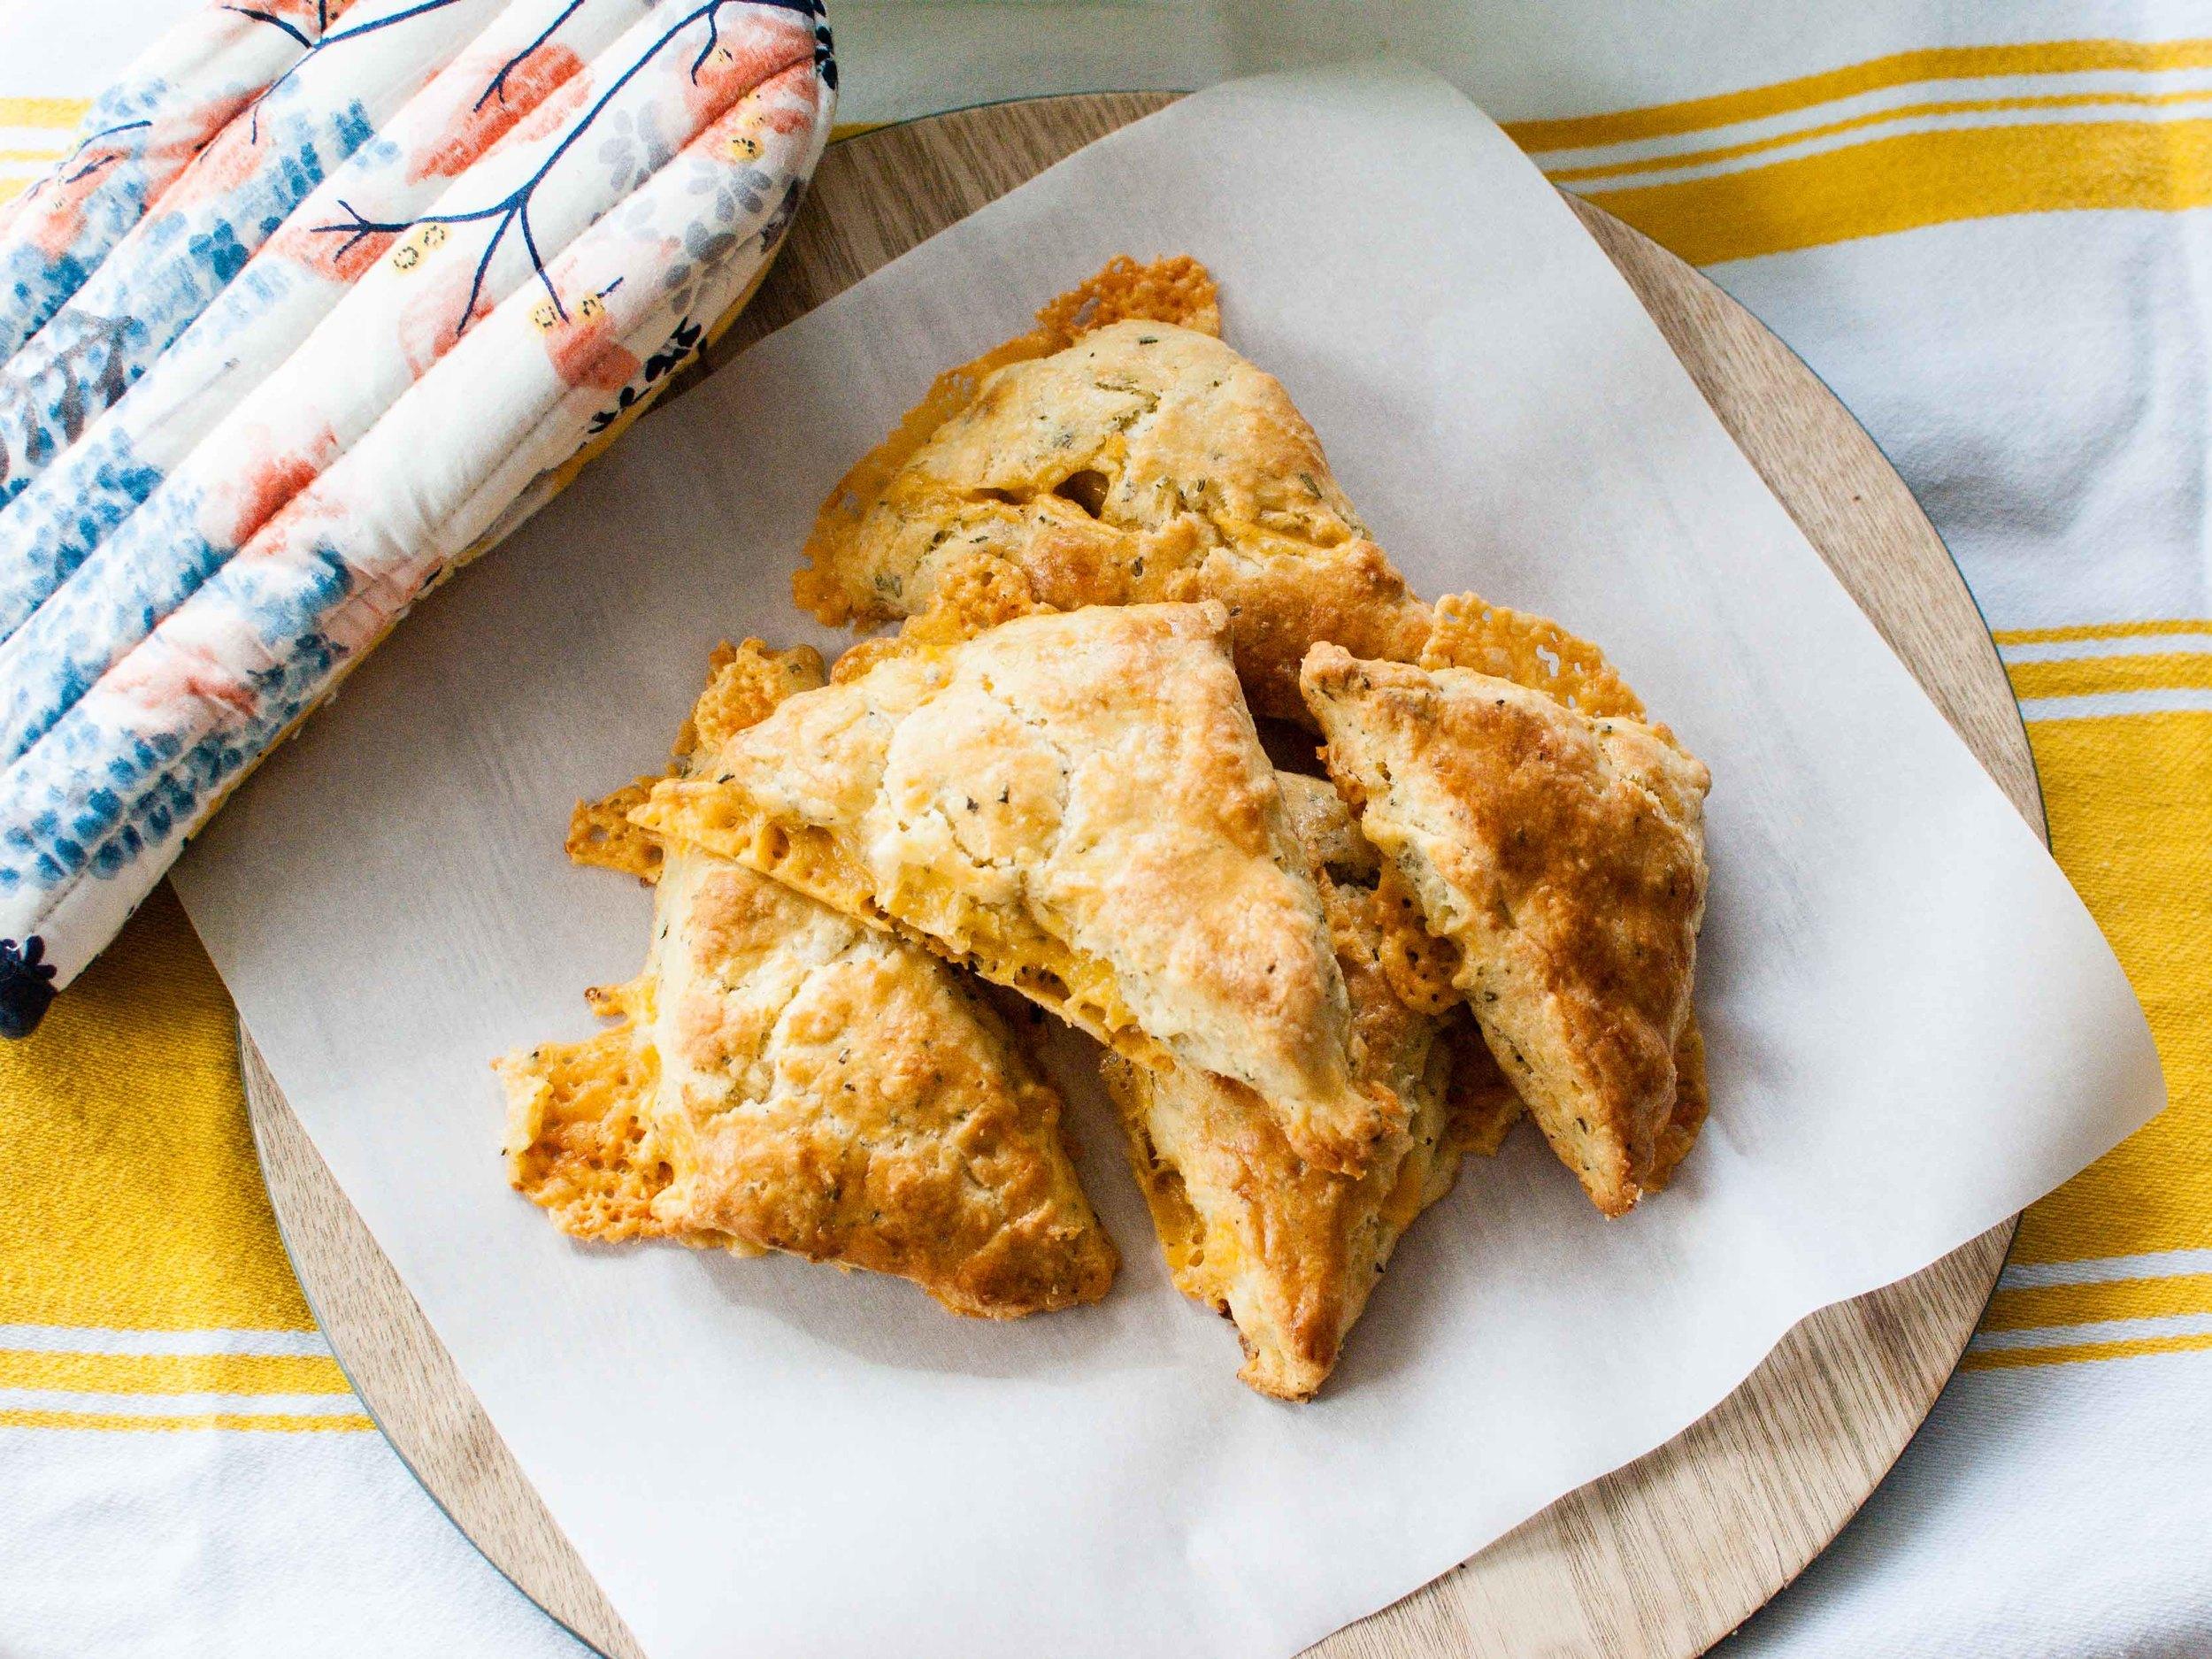 cheddar-rosemary scones